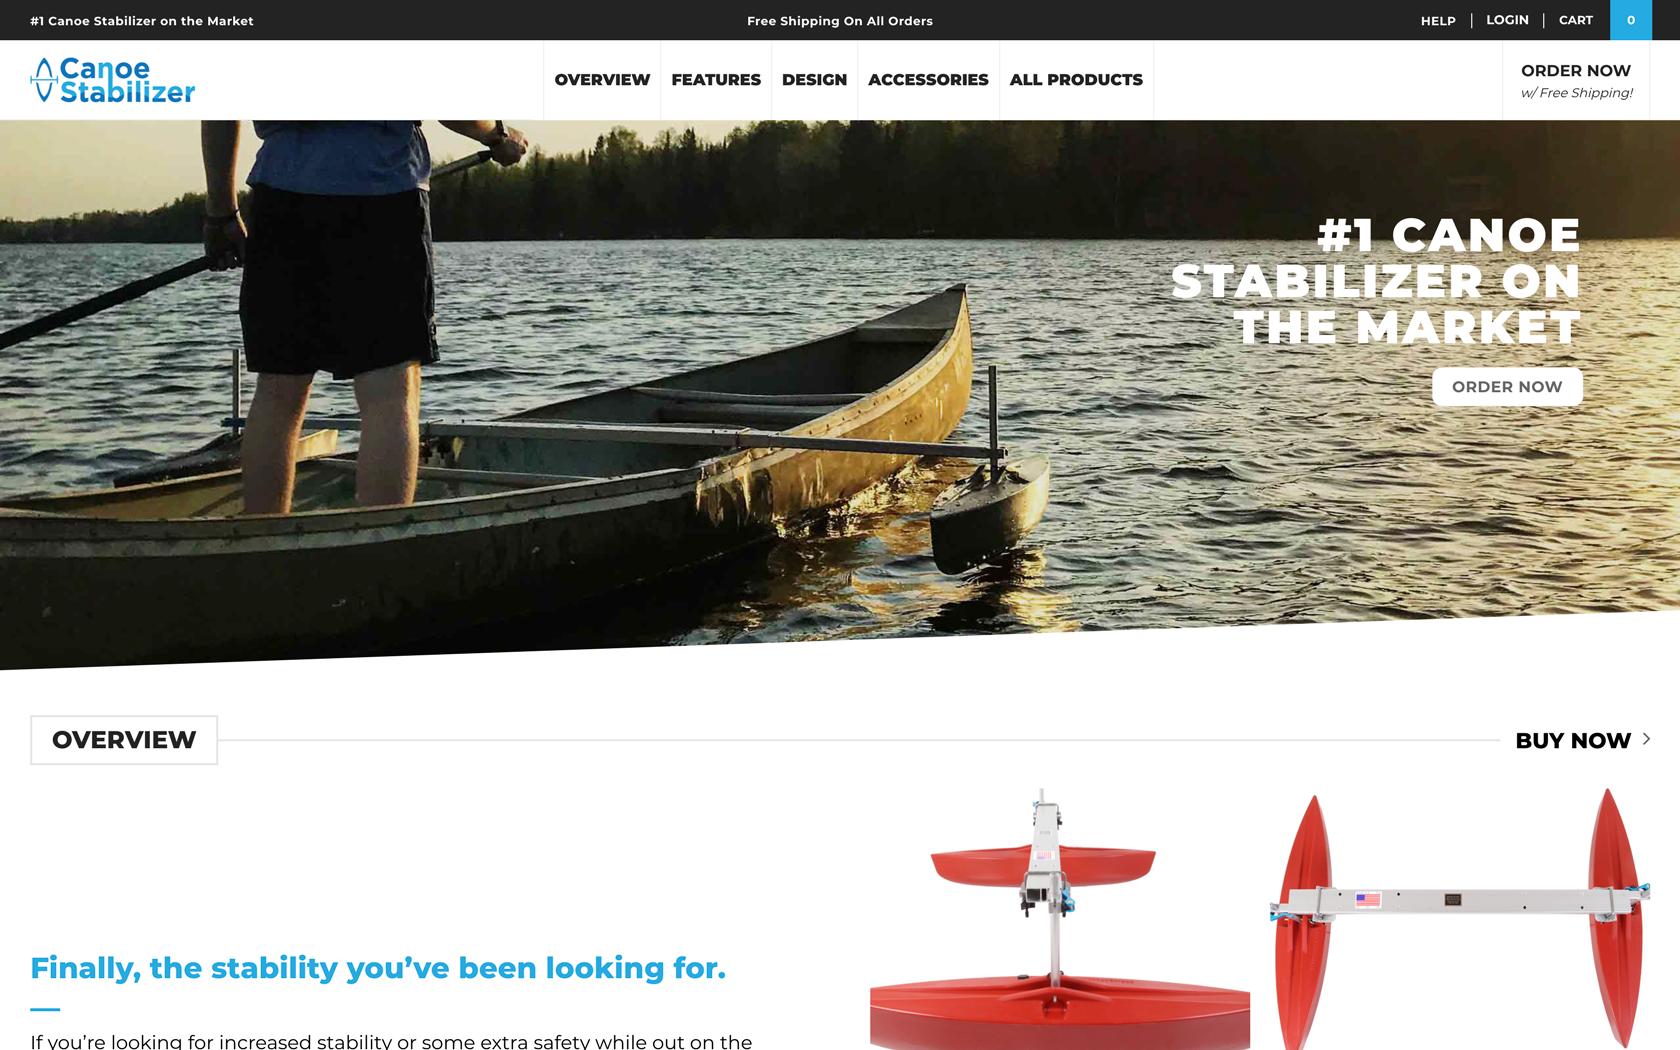 Canoe Stabilizer